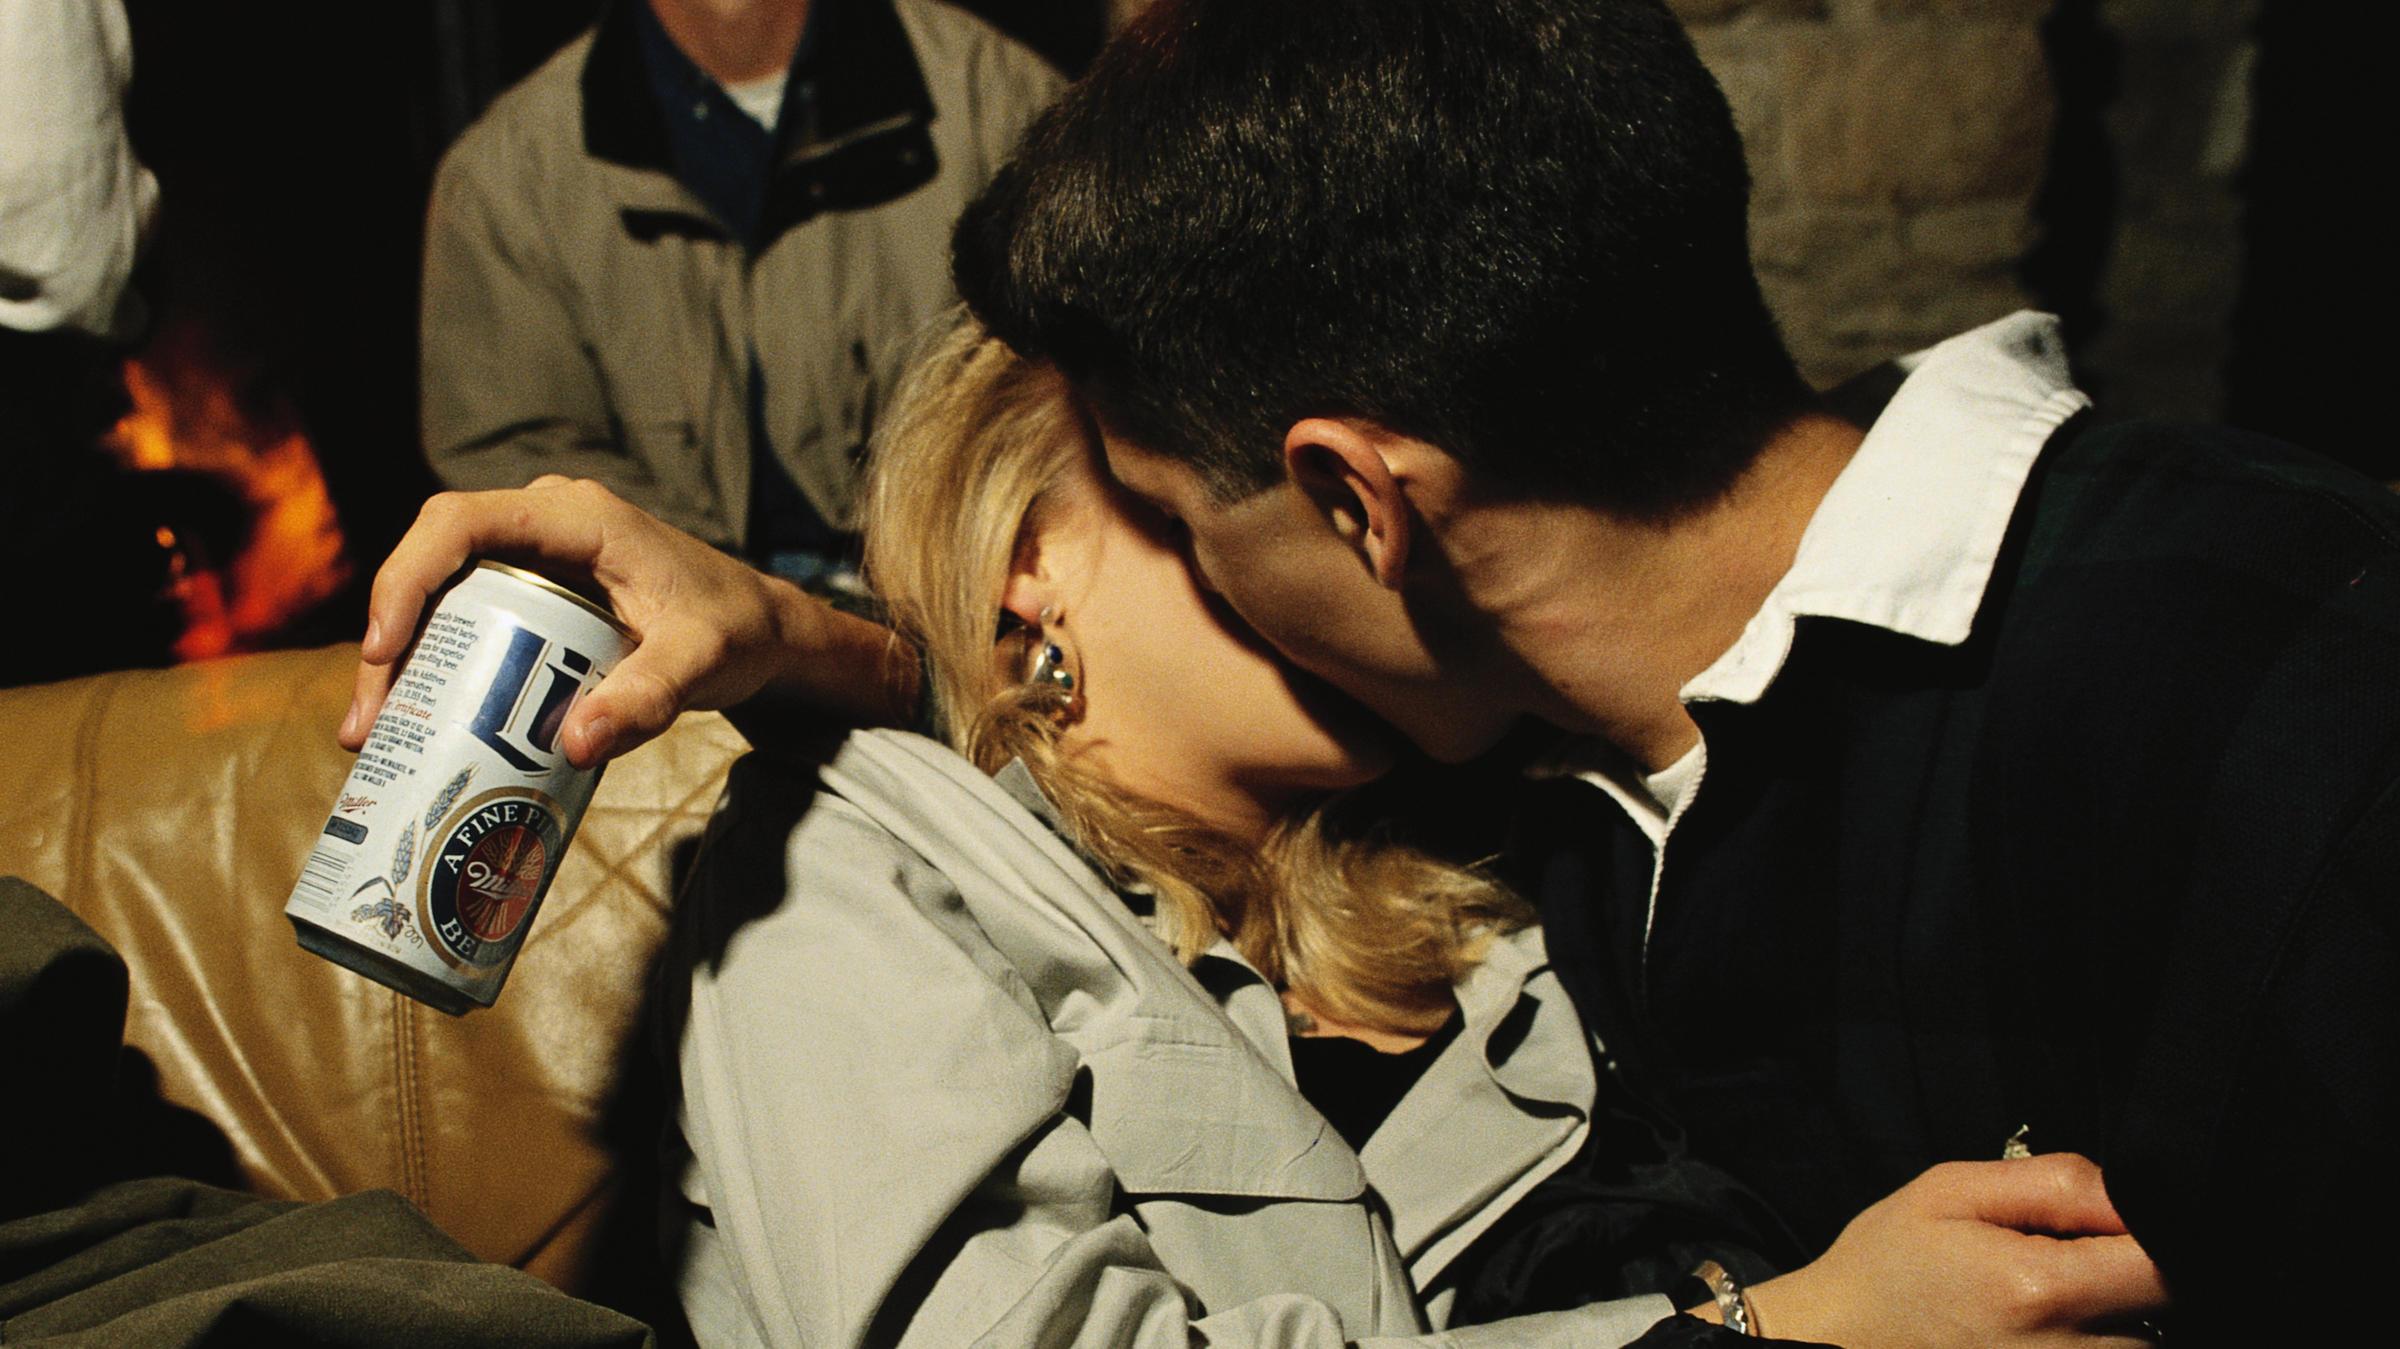 Dnevniki kerri 2 sezon online dating